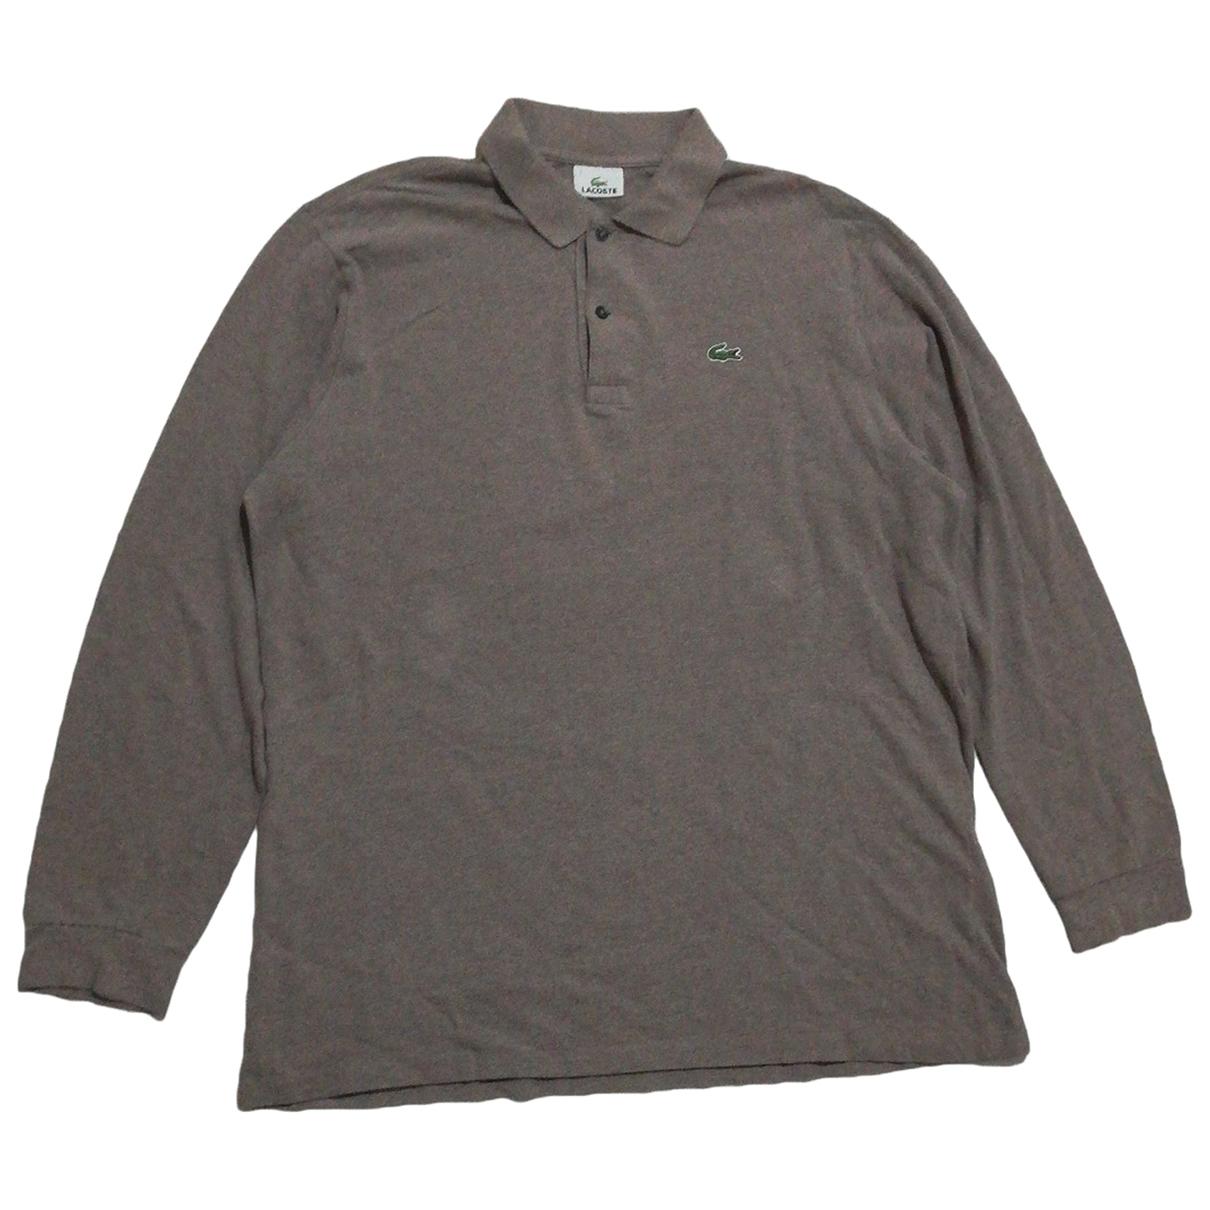 Lacoste N Cotton Polo shirts for Men XXXL International